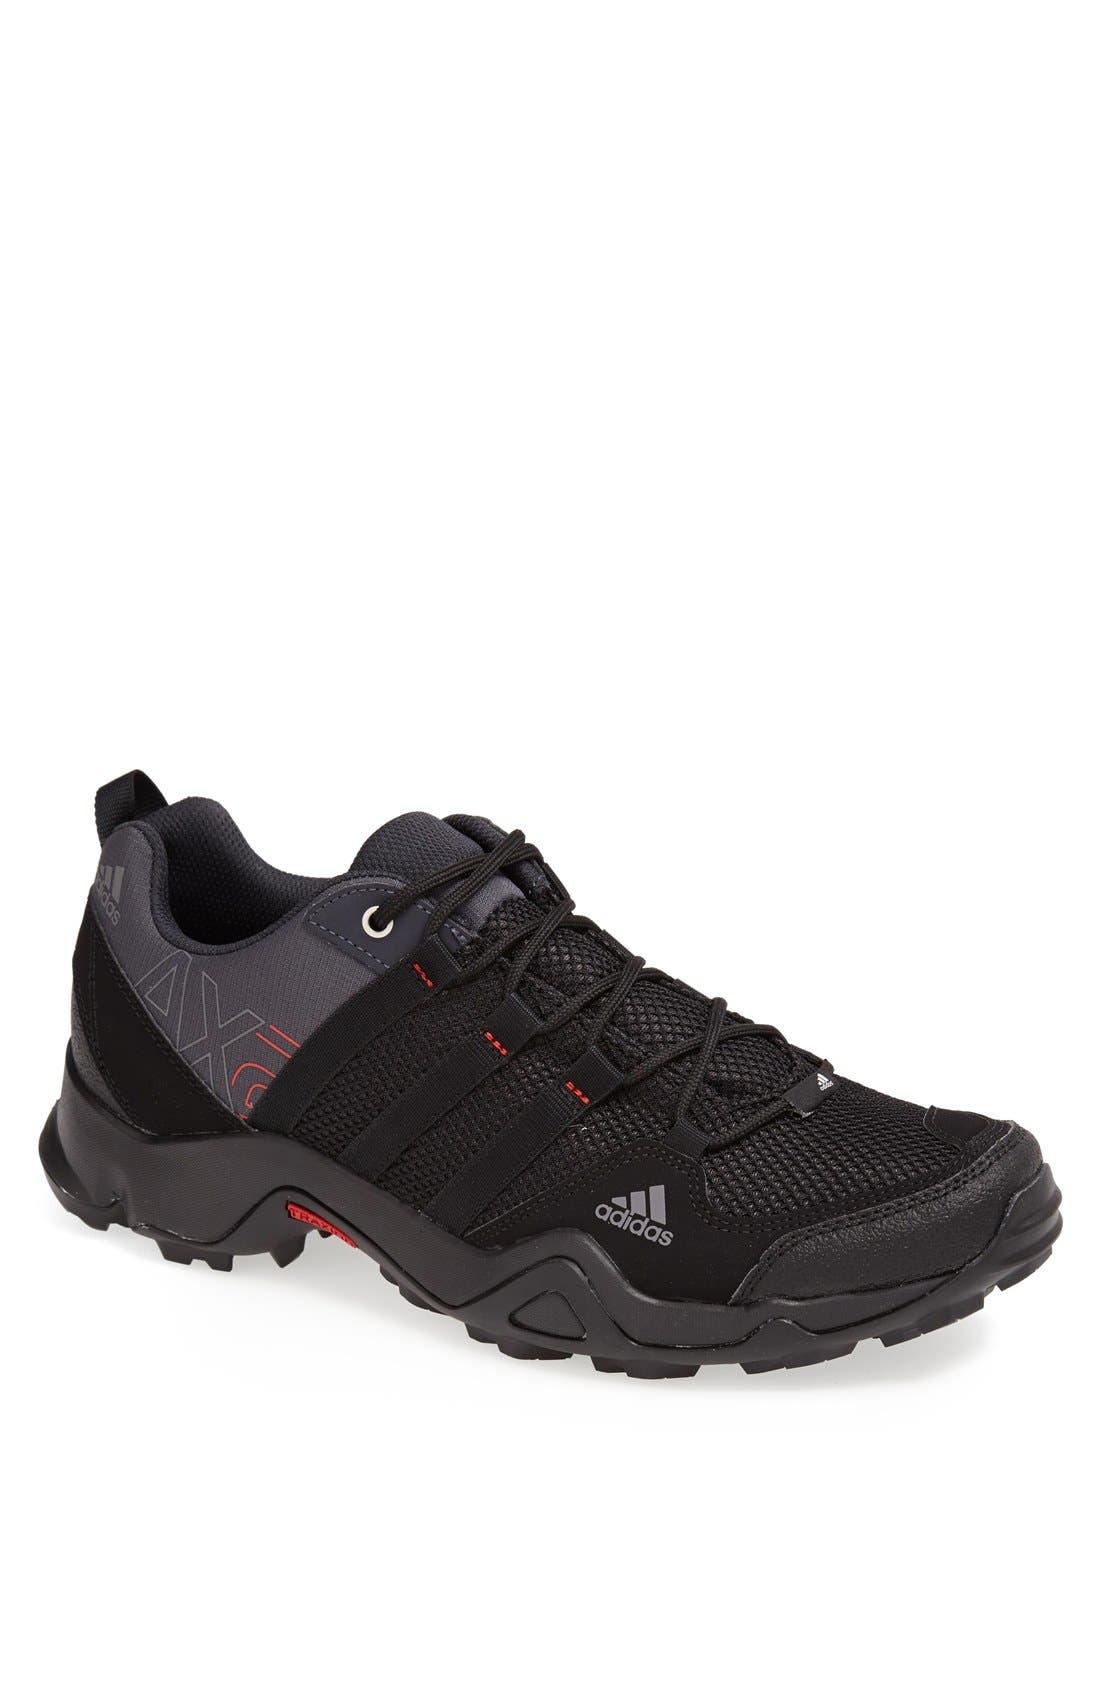 'AX2' Hiking Shoe,                             Main thumbnail 1, color,                             022